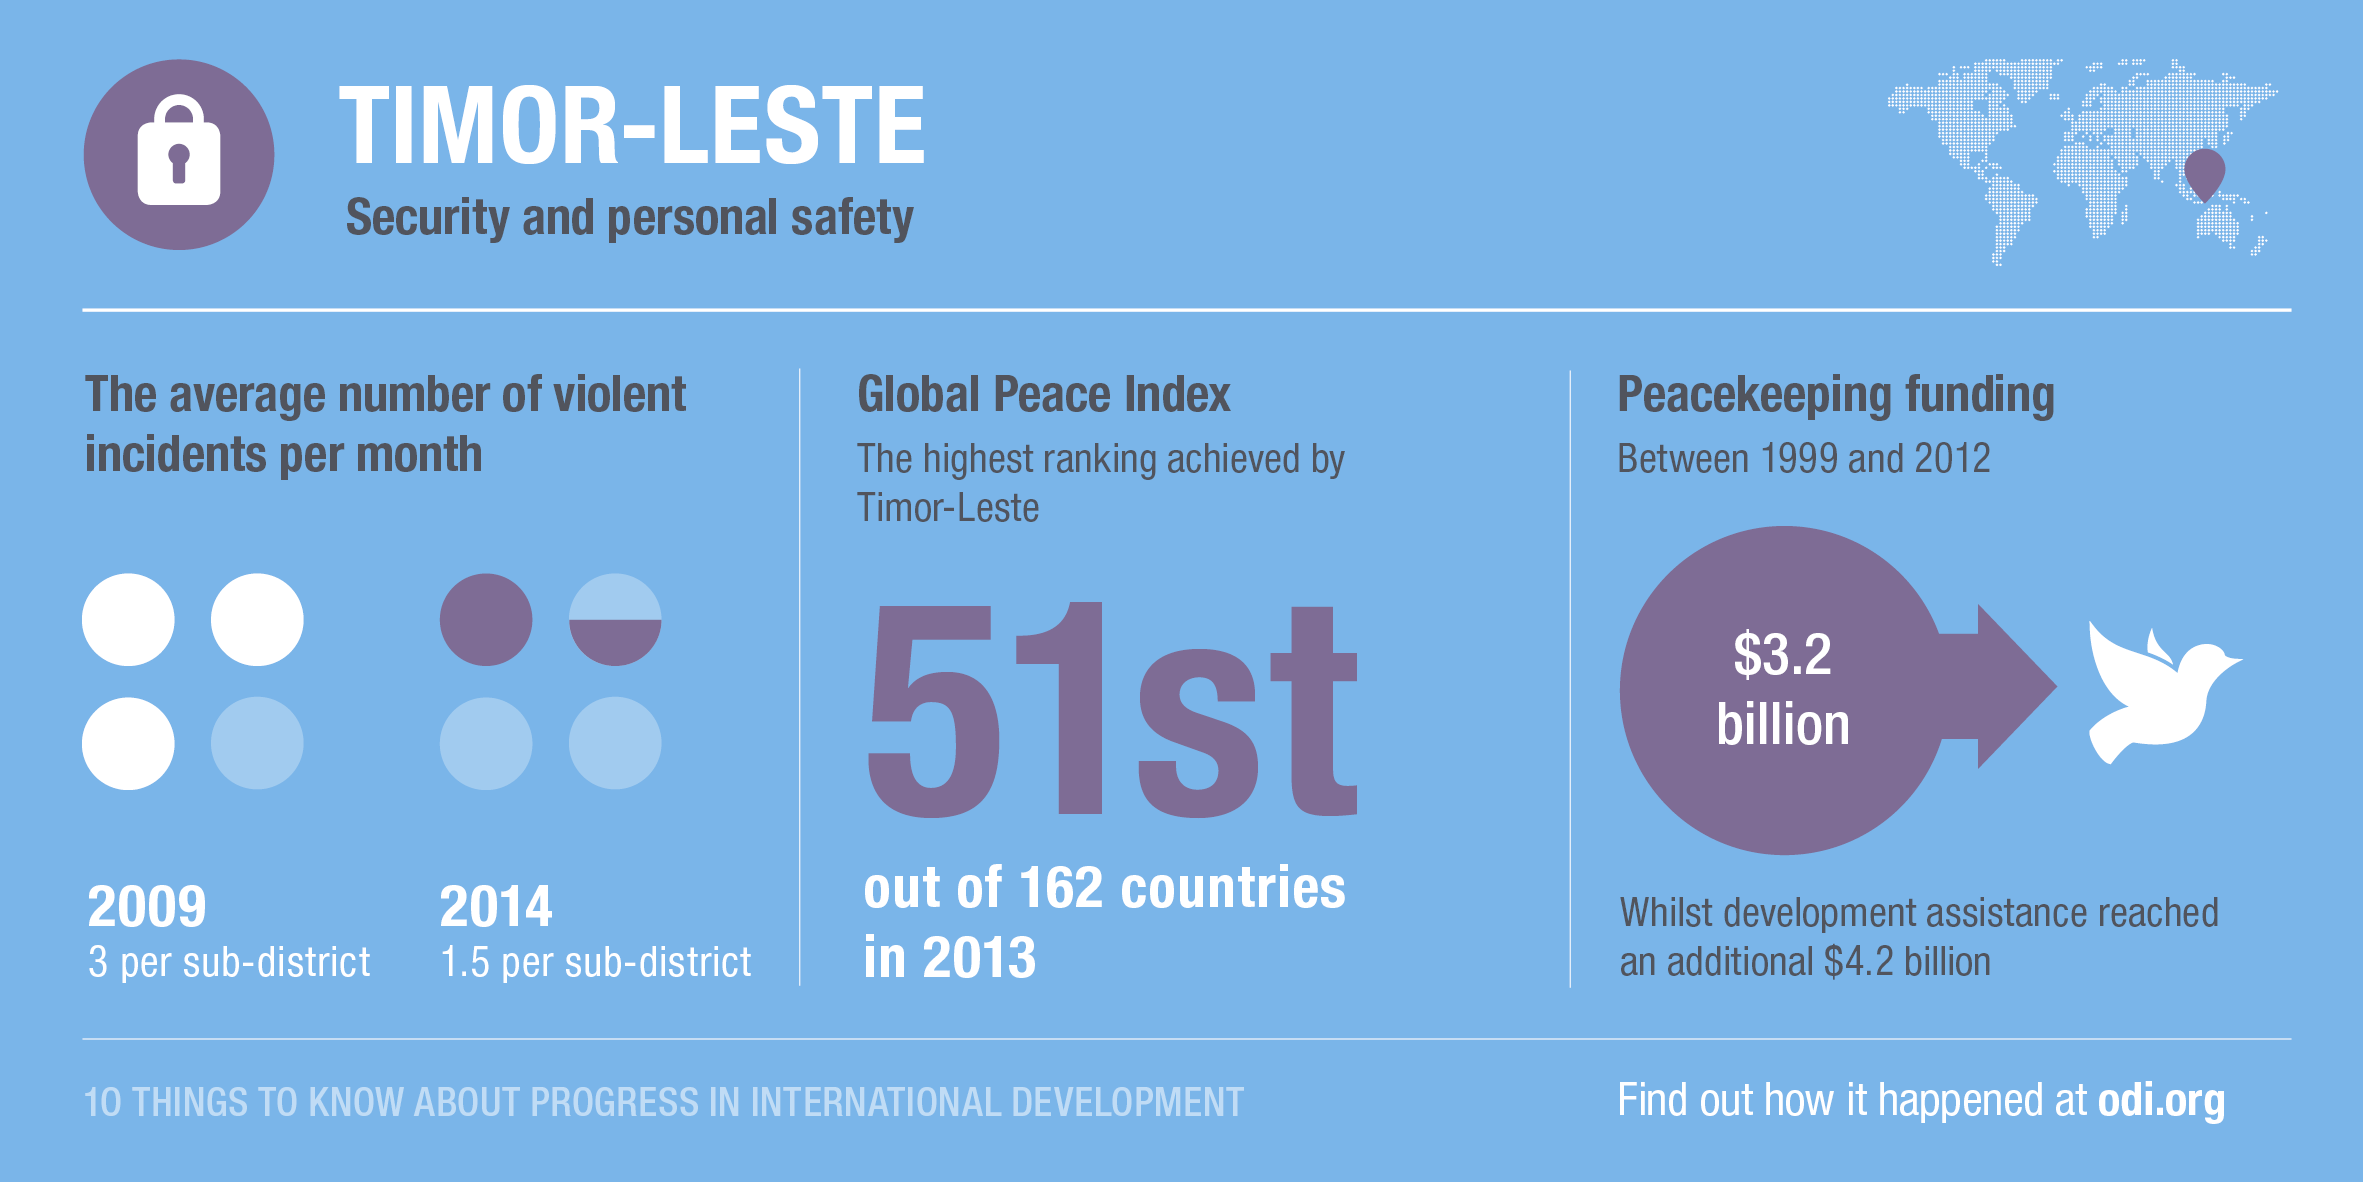 Timor Leste's progress on security